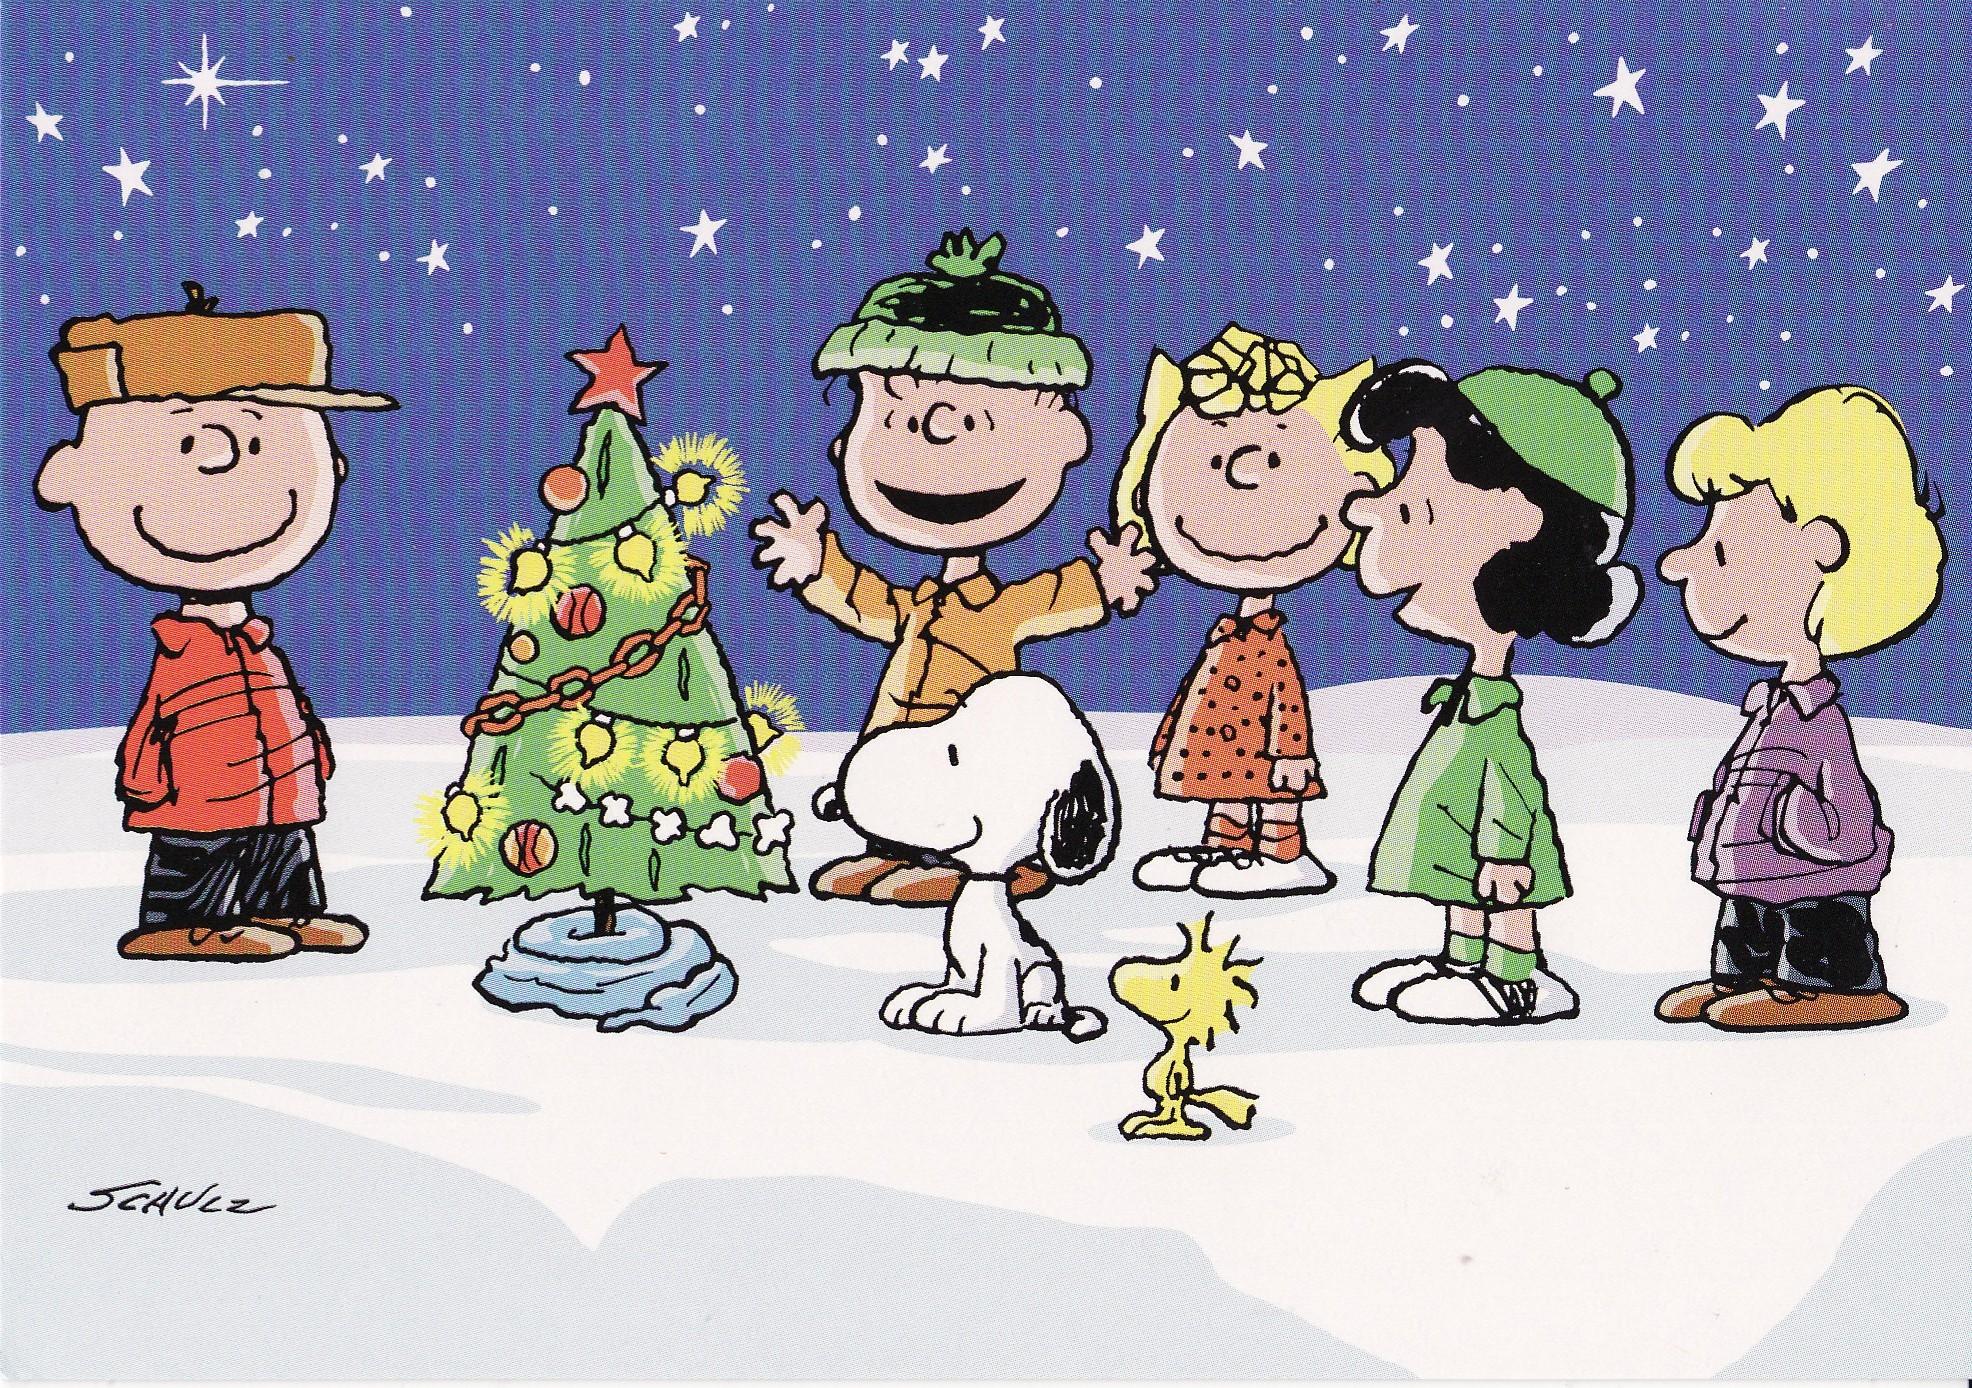 Charlie Brown Thanksgiving Desktop Wallpaper (49+ images)